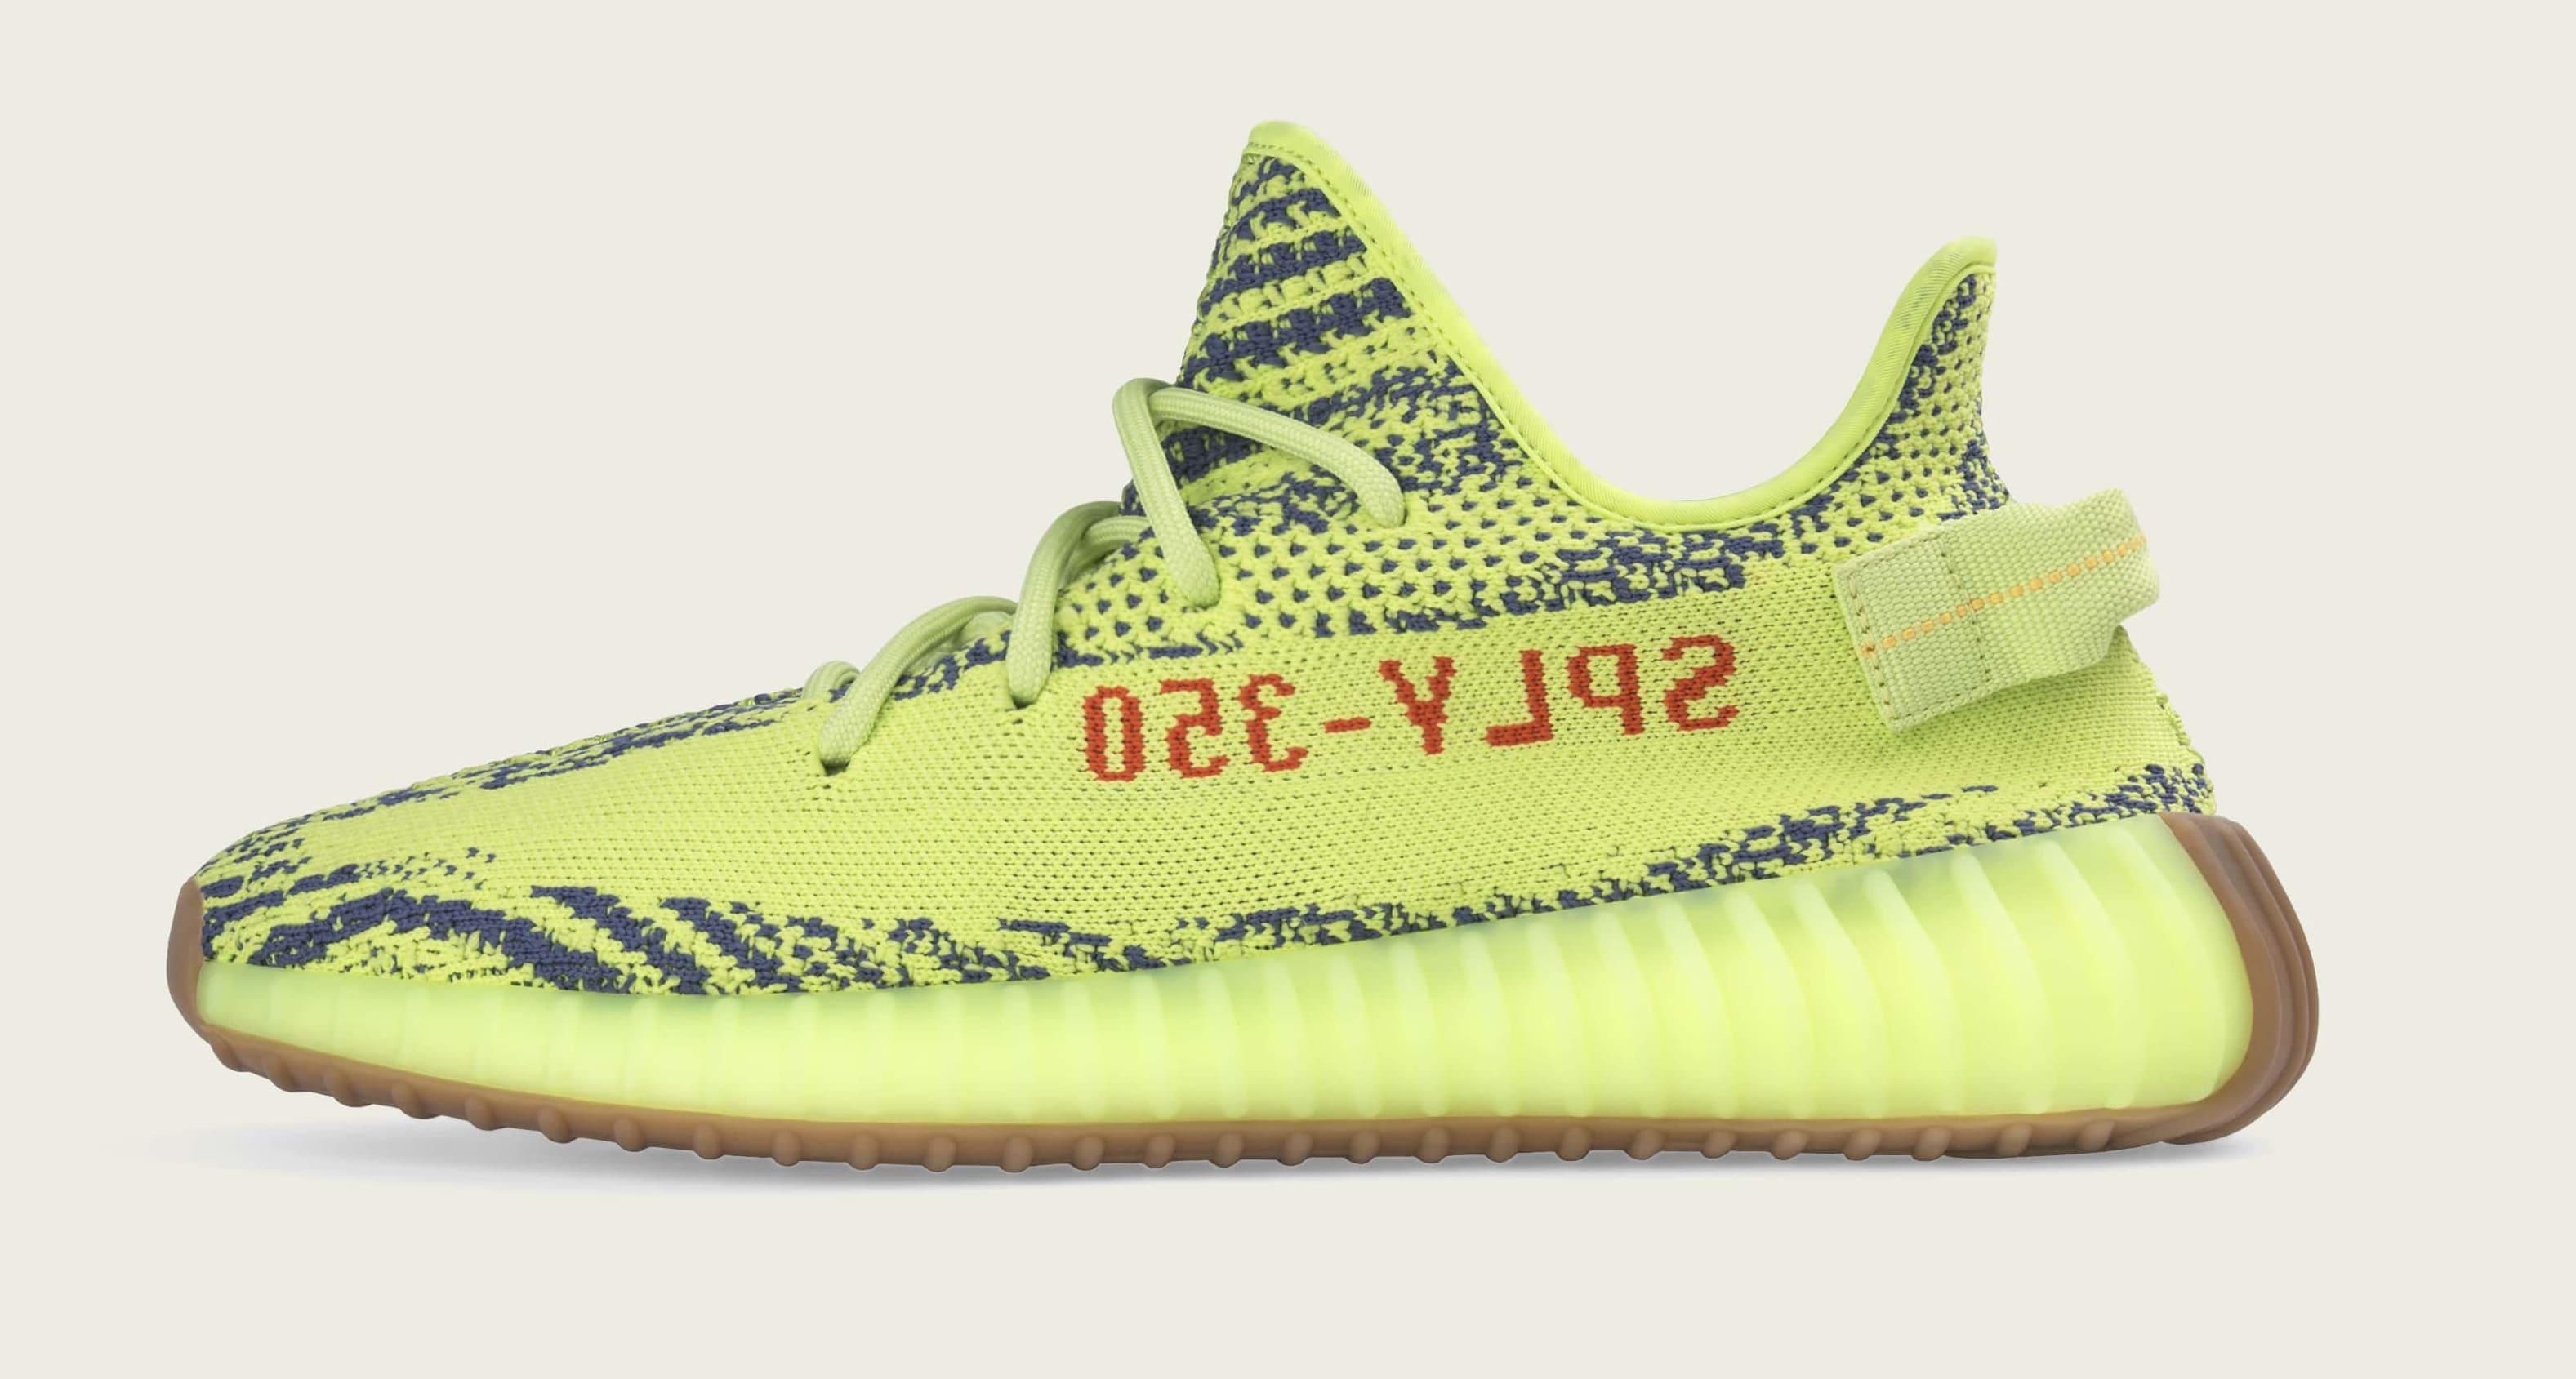 Adidas Yeezy Boost 350 V2 'Semi Frozen Yellow' B37572 (Medial)